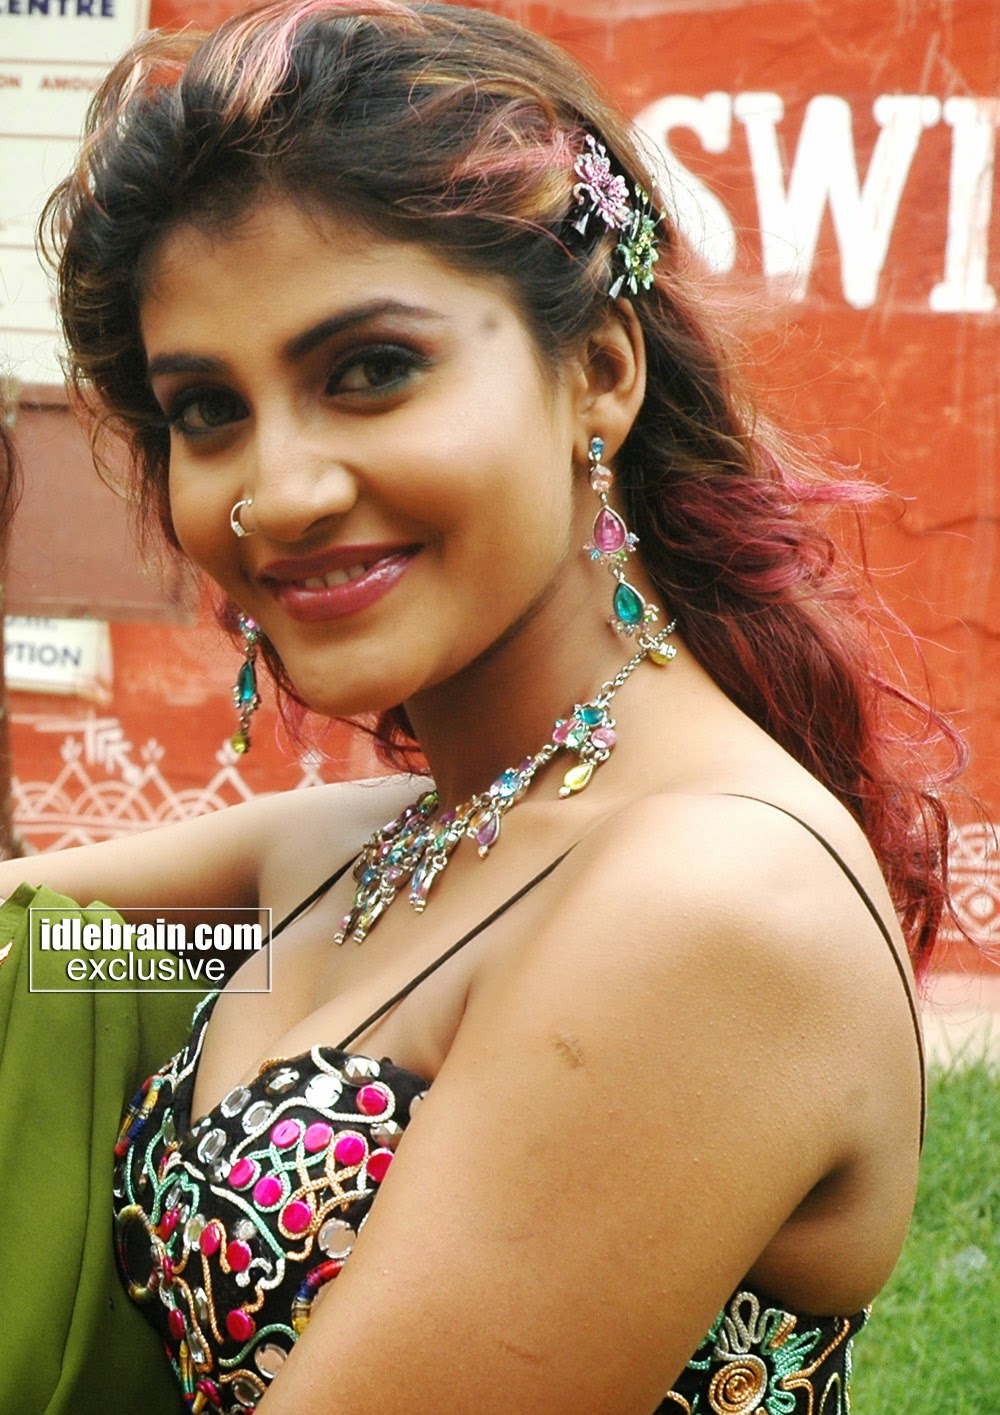 Kausha Rach Porn - South Indian actress Kausha Rach black wide L hot navel stills photos   Hot  Model Girls Hot Bikini Pics